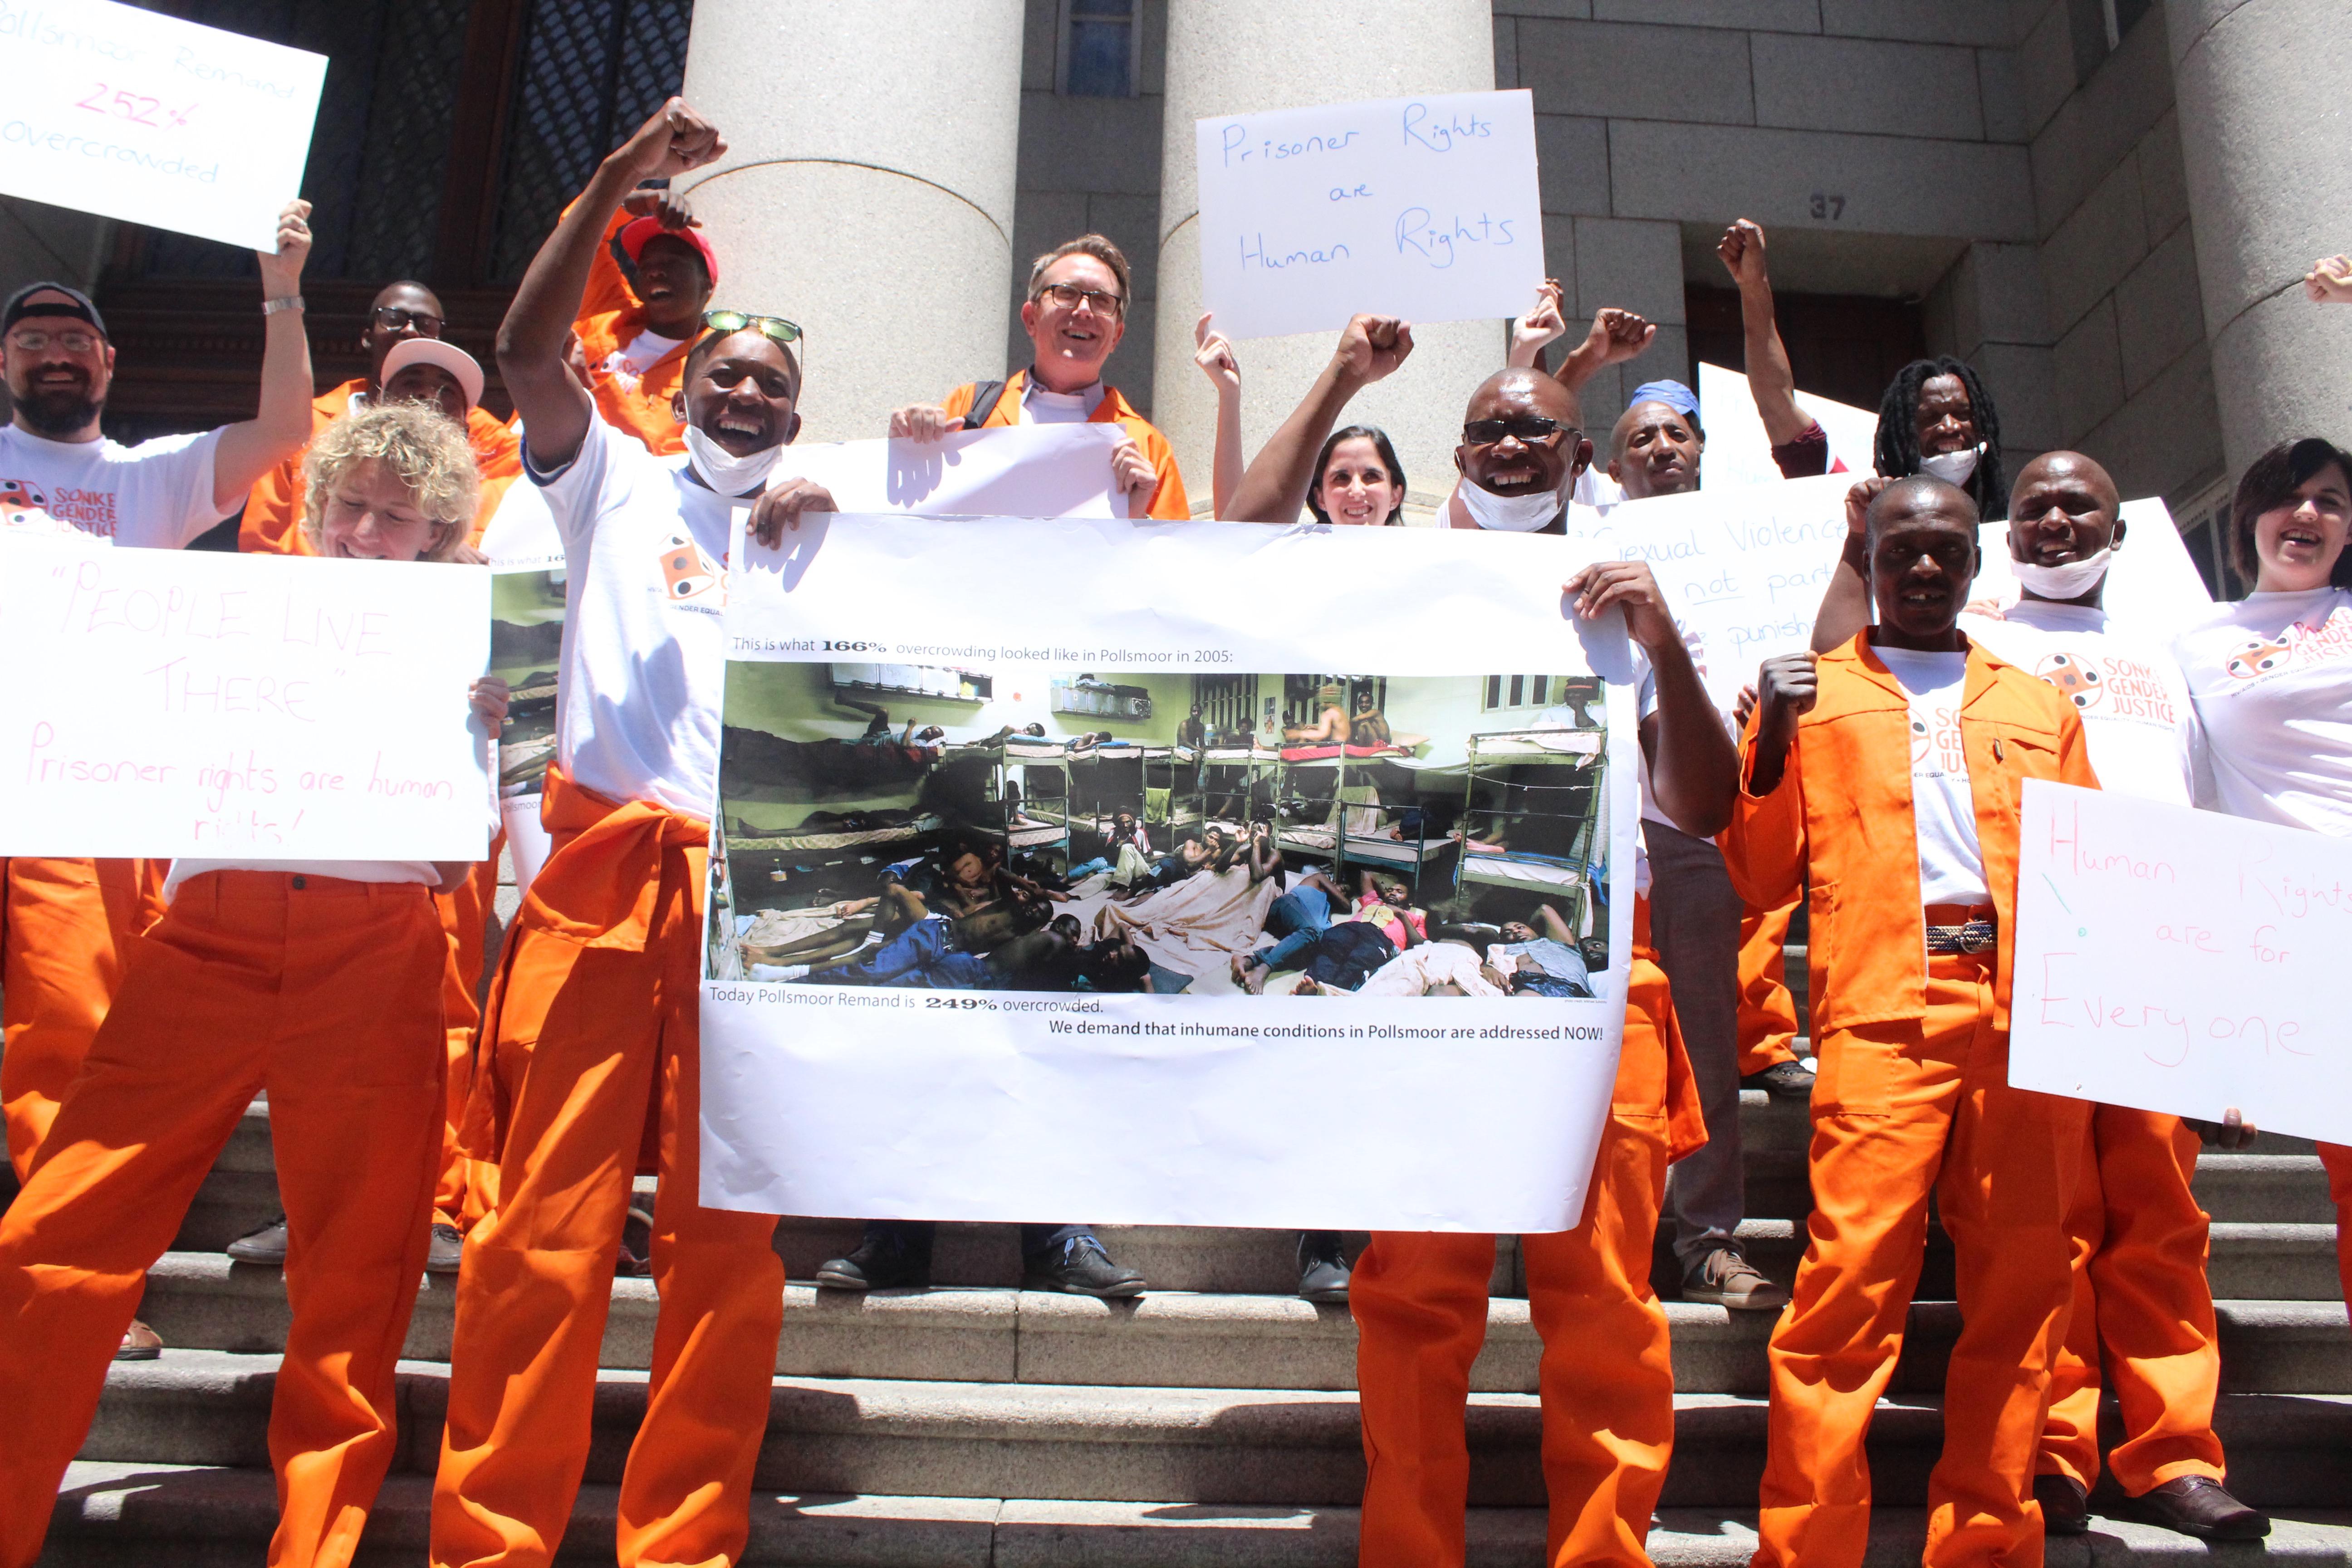 Prisoners Protesting